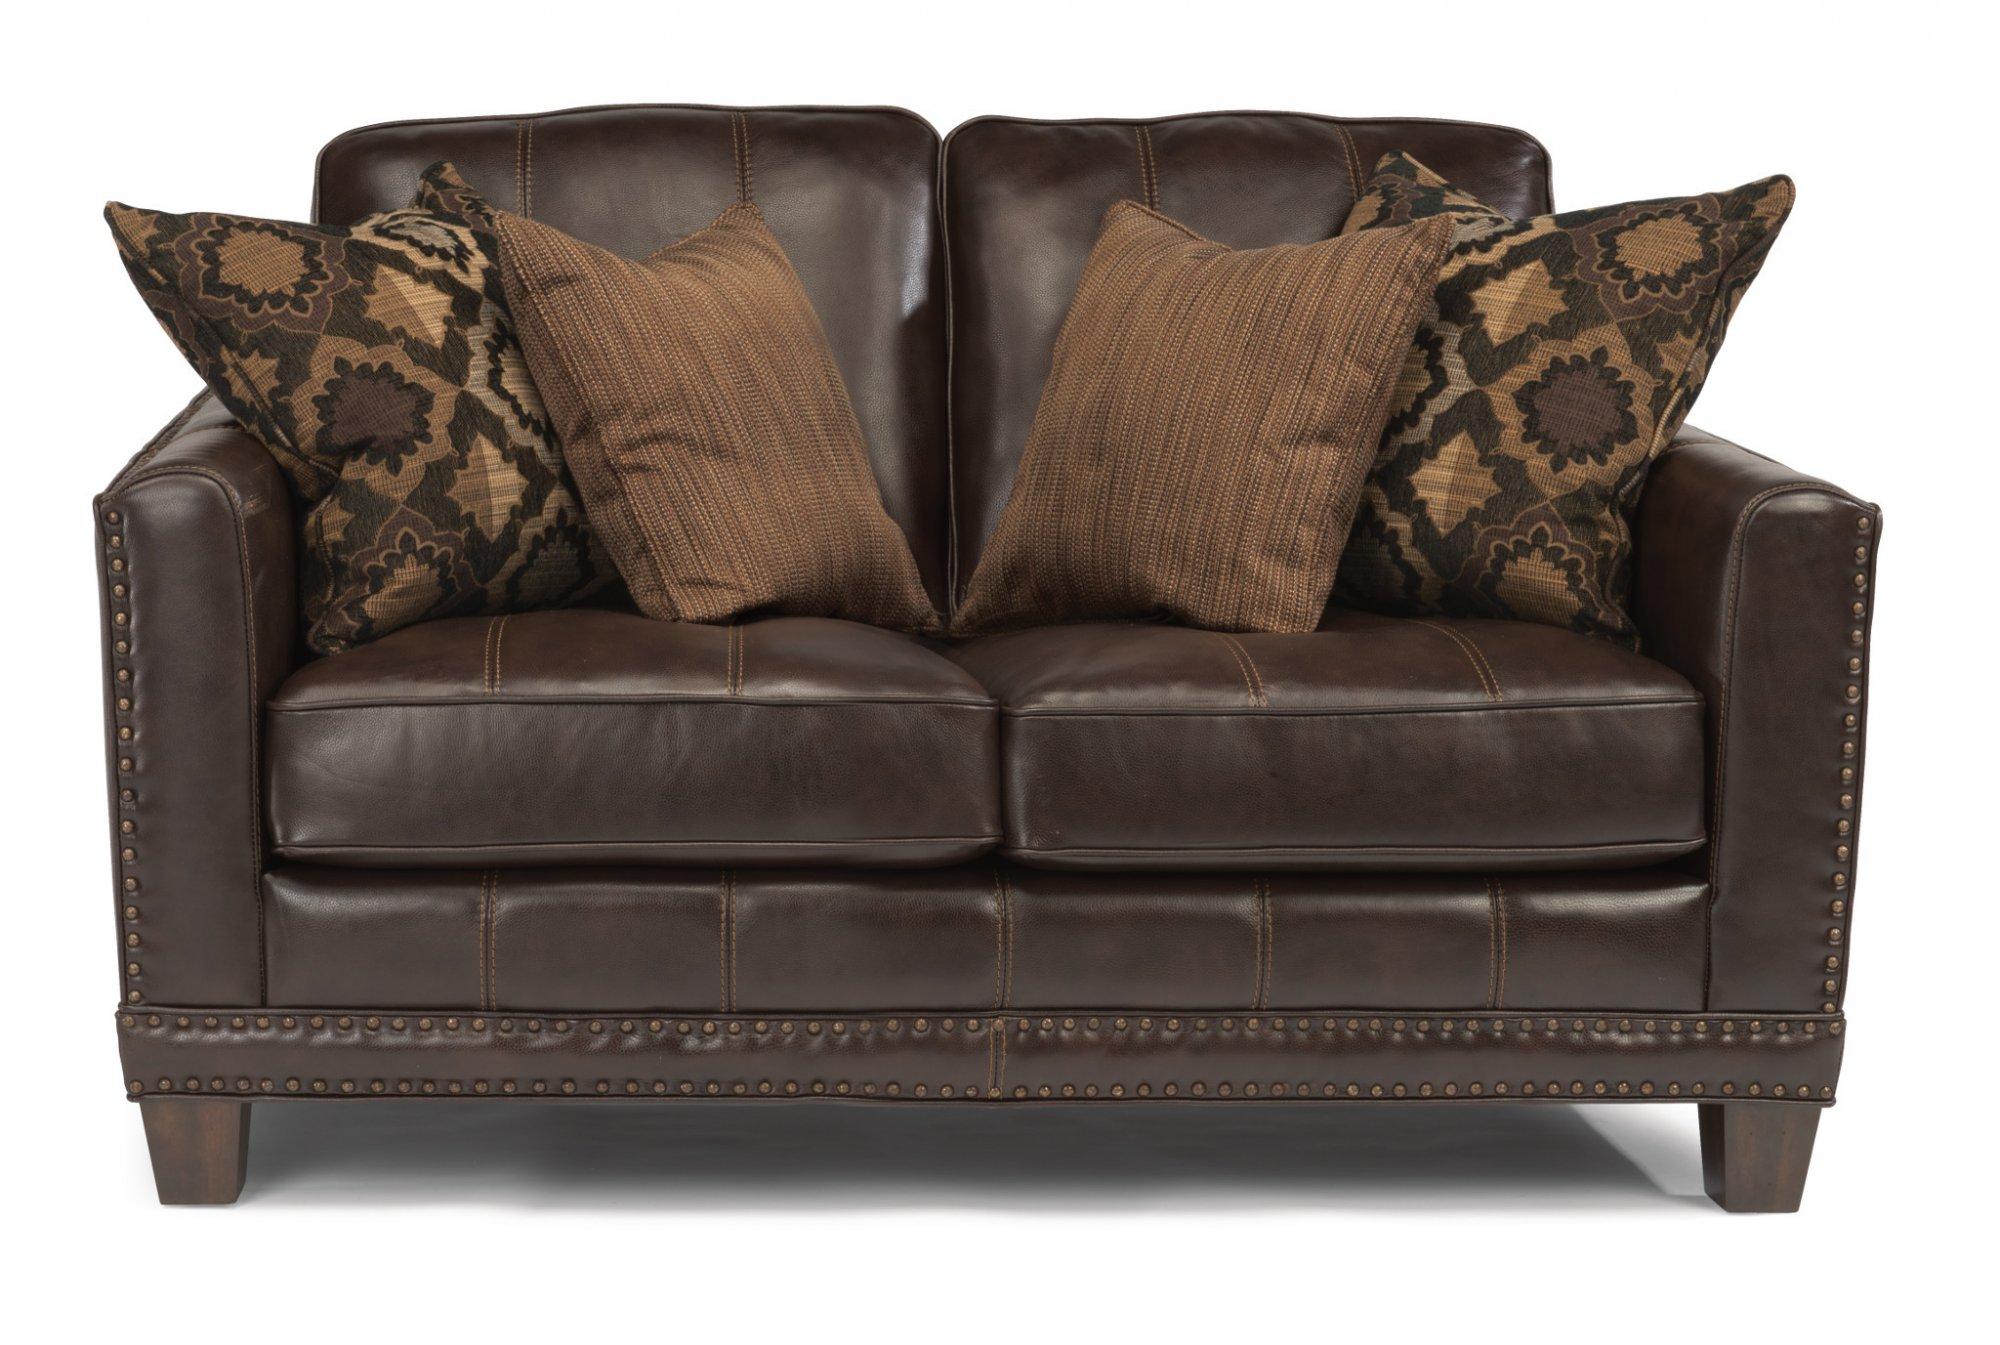 Flexsteel Port Royal  Leather Loveseat